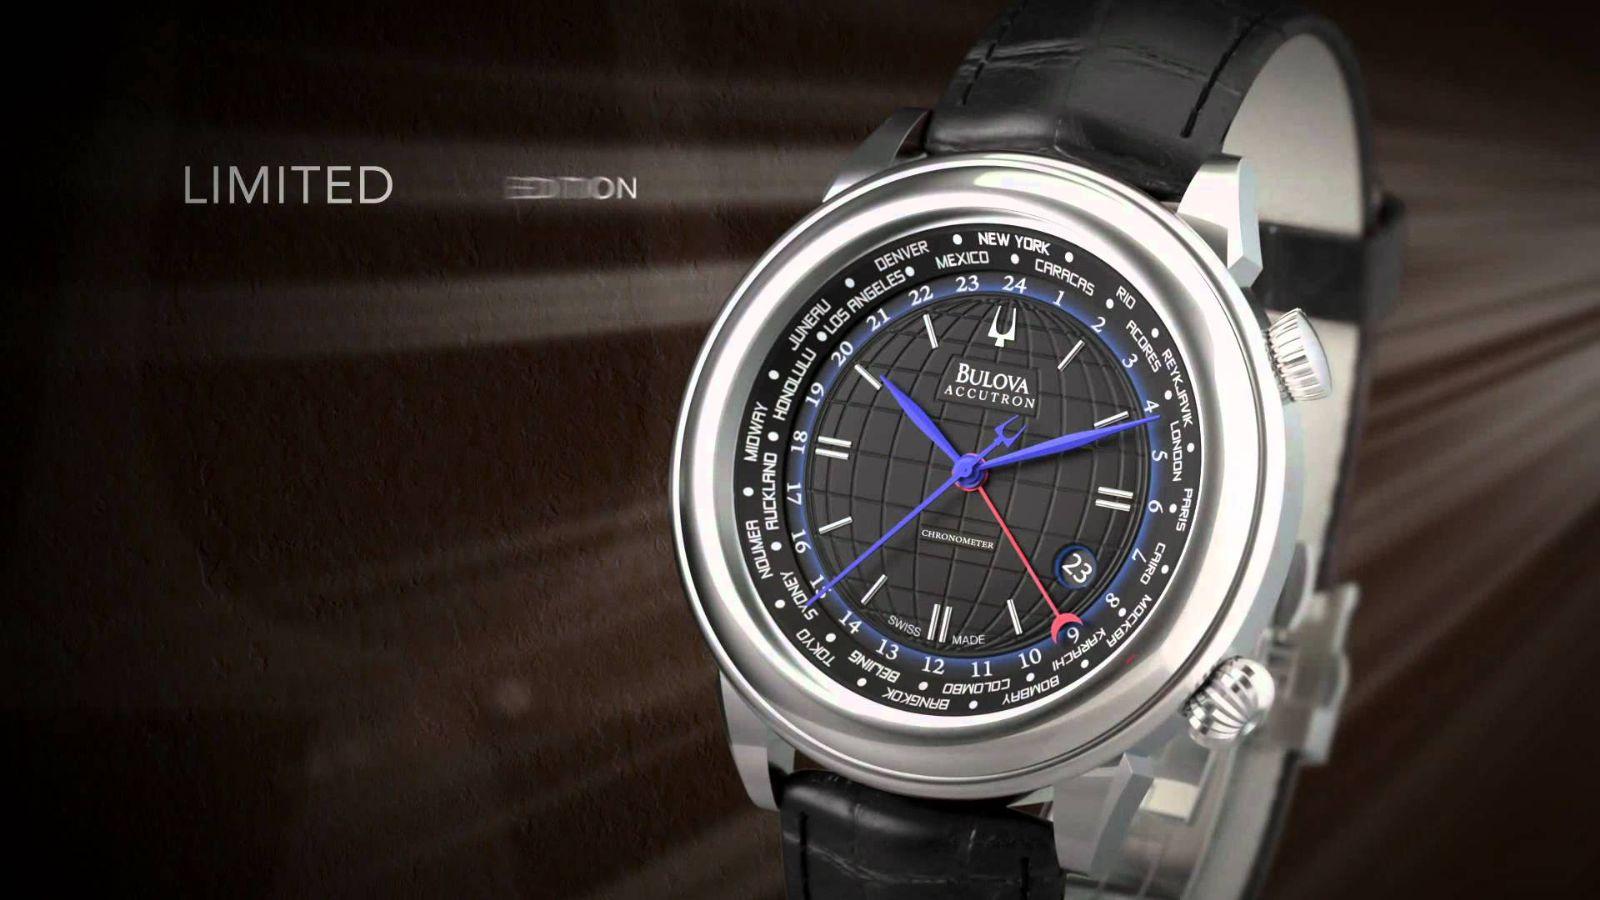 2e66b6d8fa8 đồng hồ Bulova Branson Swiss automatic với GMT